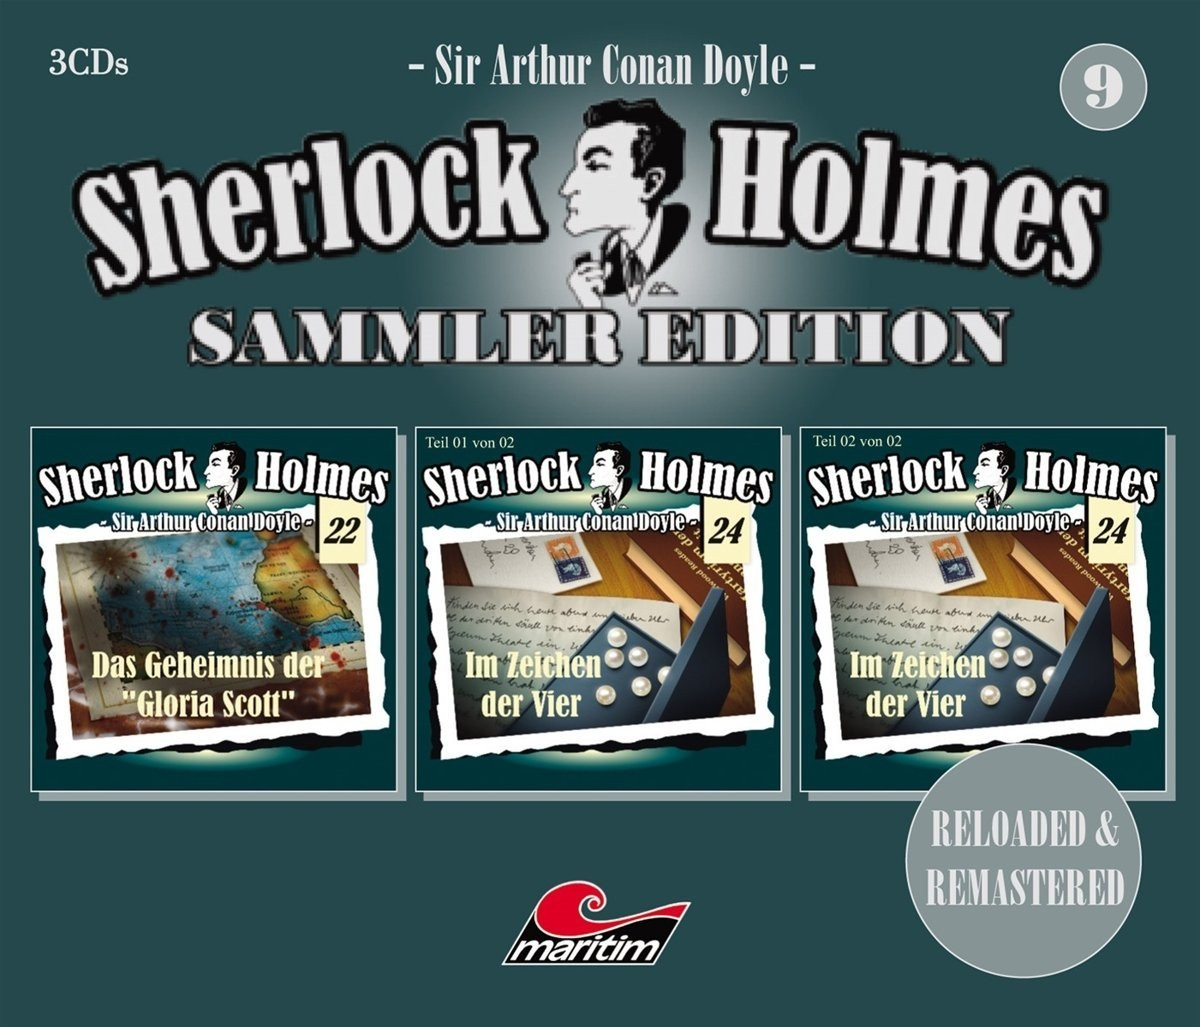 Sherlock Holmes - Sammler Edition - Box 9 (Folge 22, 24, 24)